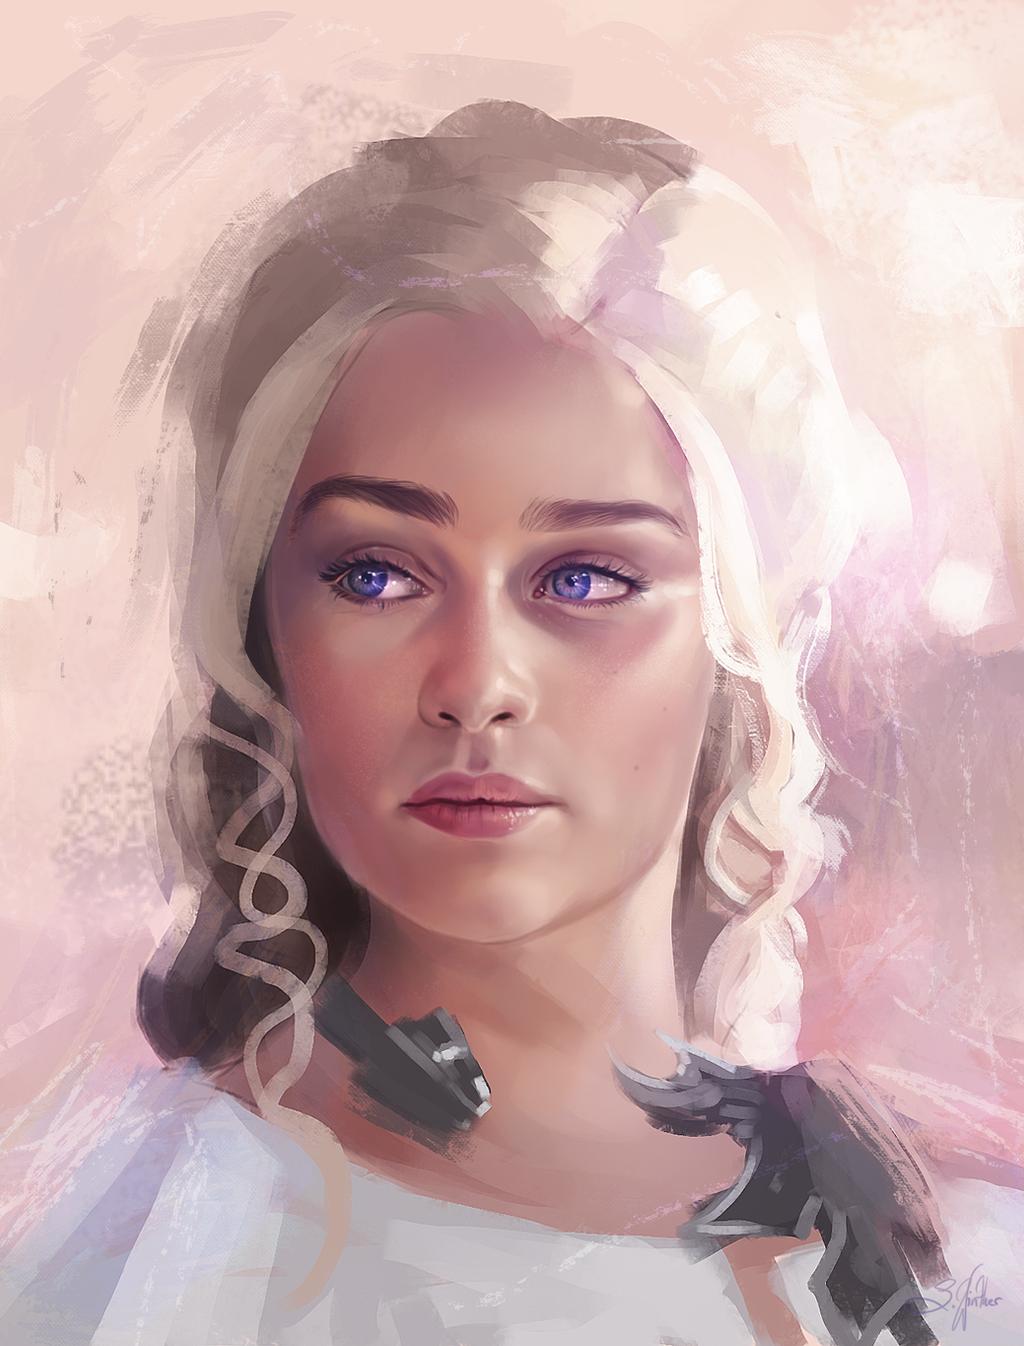 Targaryen by Sandramalie